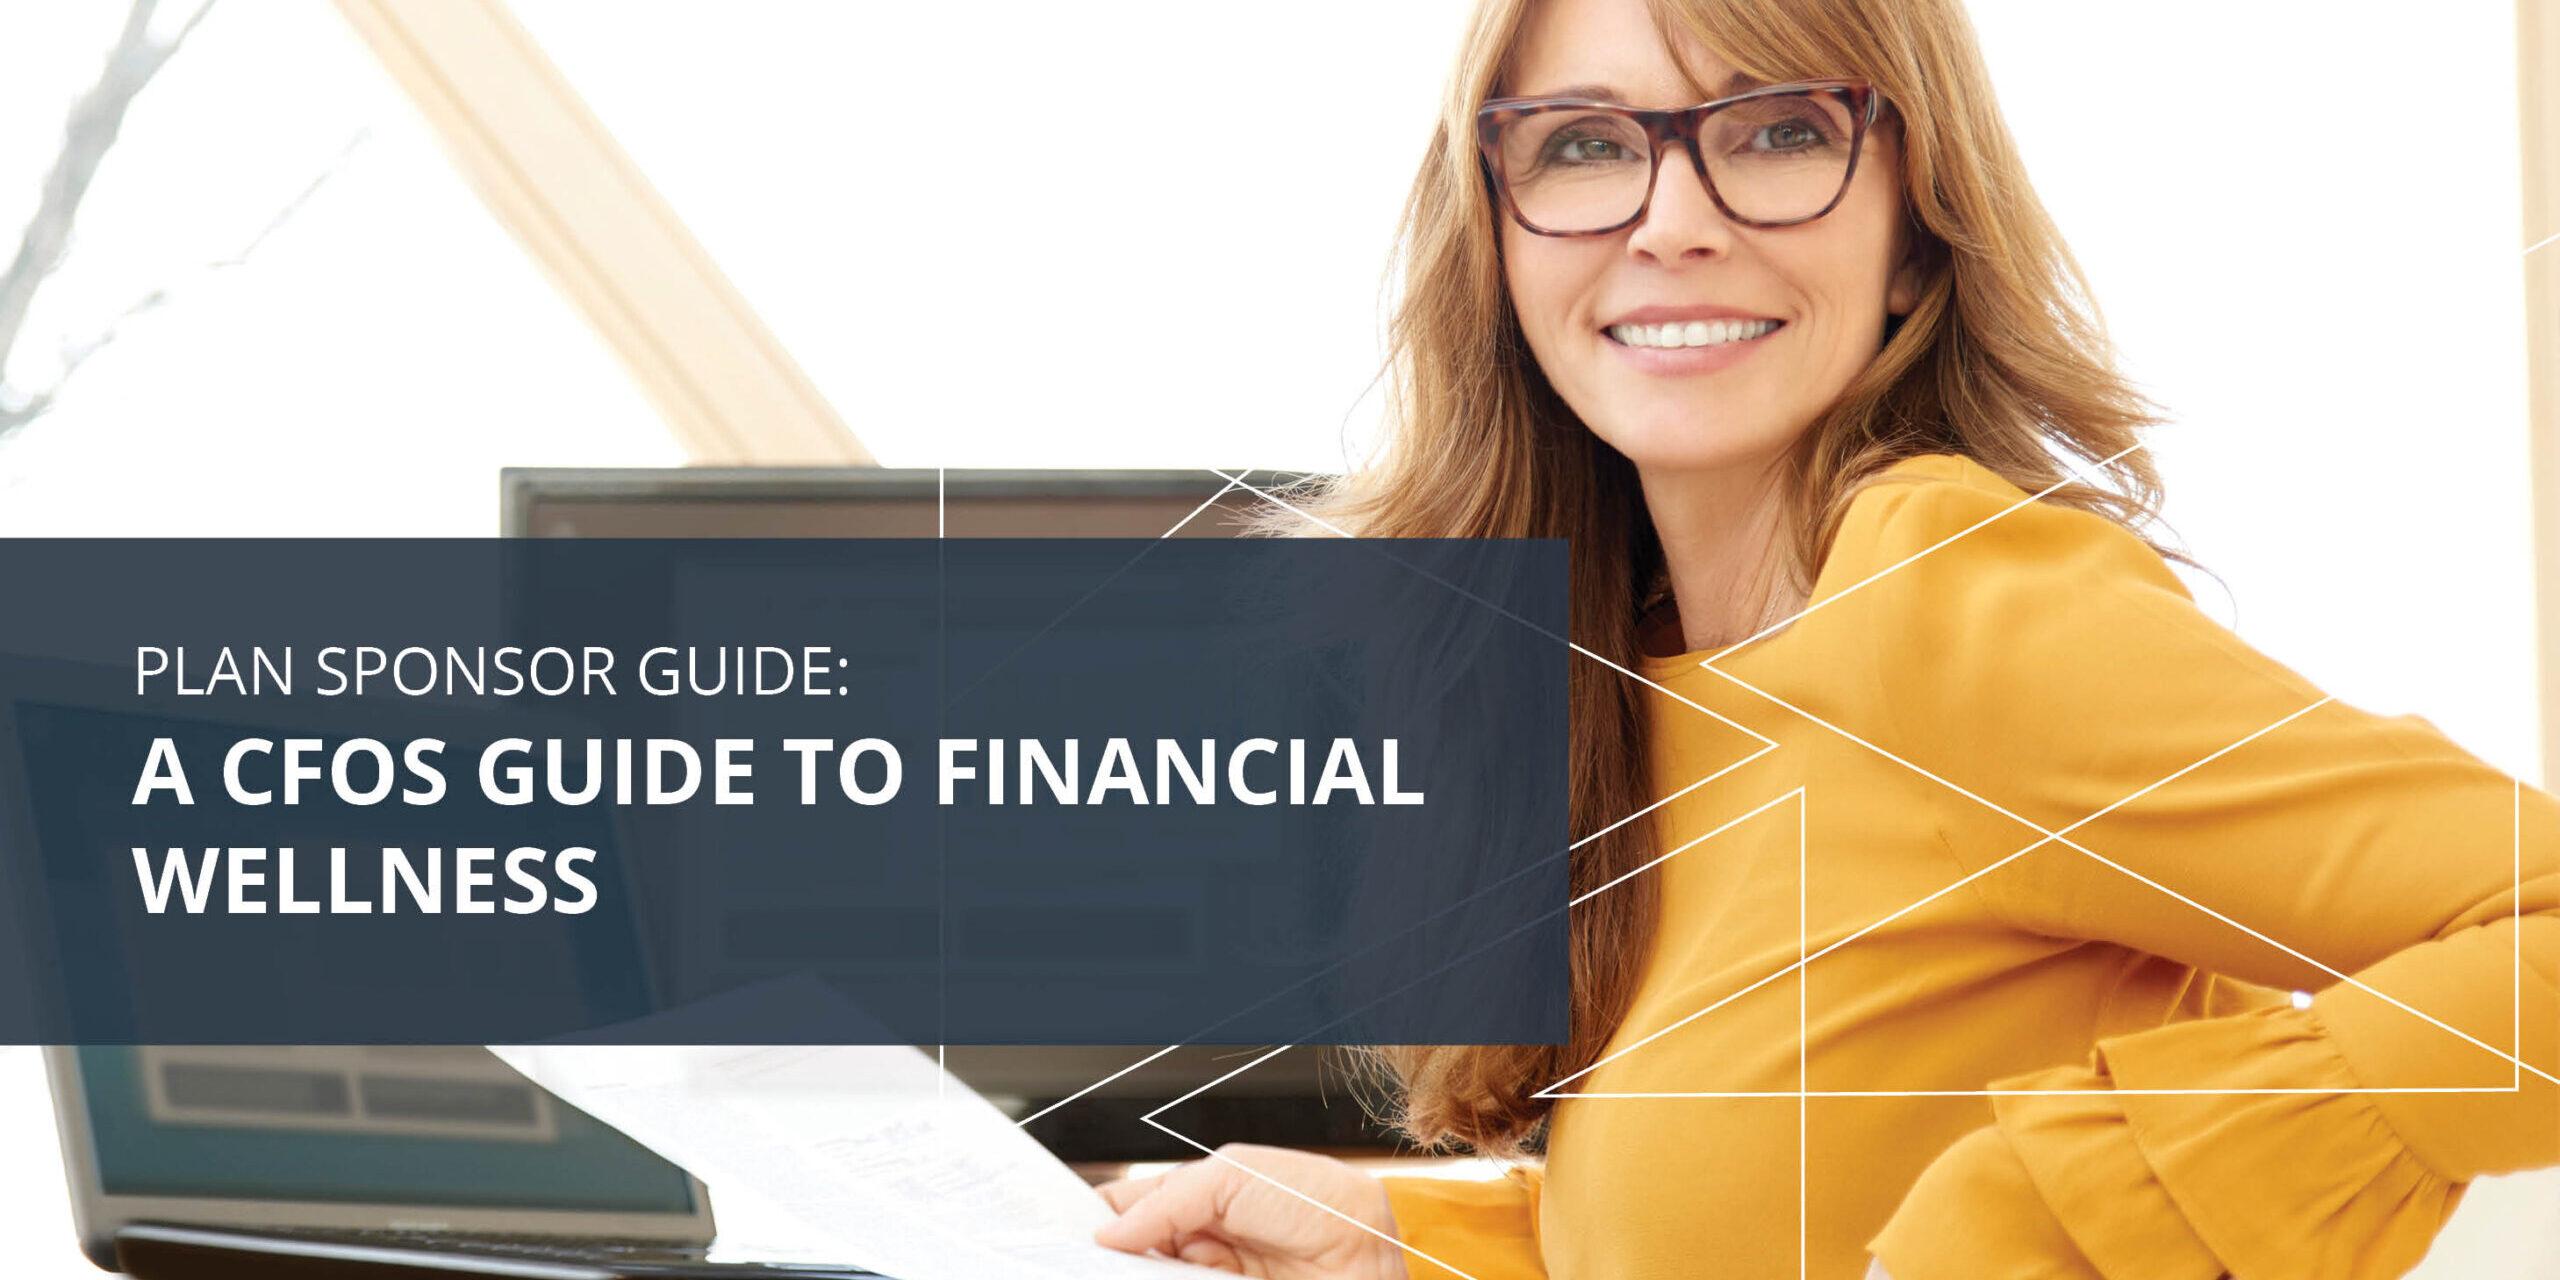 Plan Sponsor Guide 2021 Q2 Headline Image-CFOs Guide to Financial Wellness